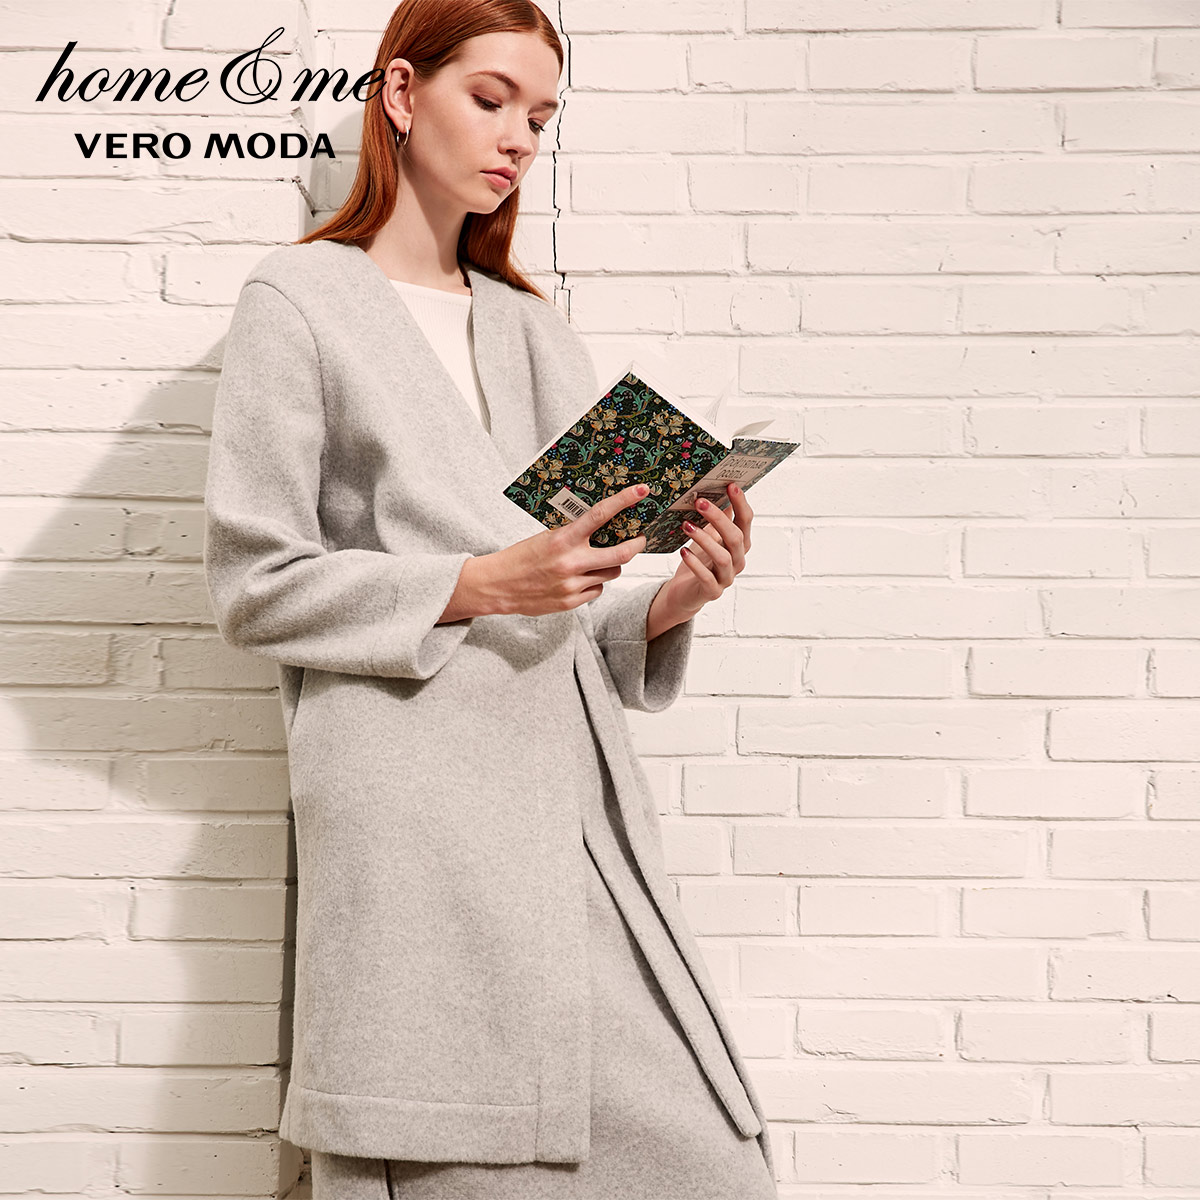 Vero Moda New Women's Mid-length Waist Belt Knitted Cardigan   3184R3507